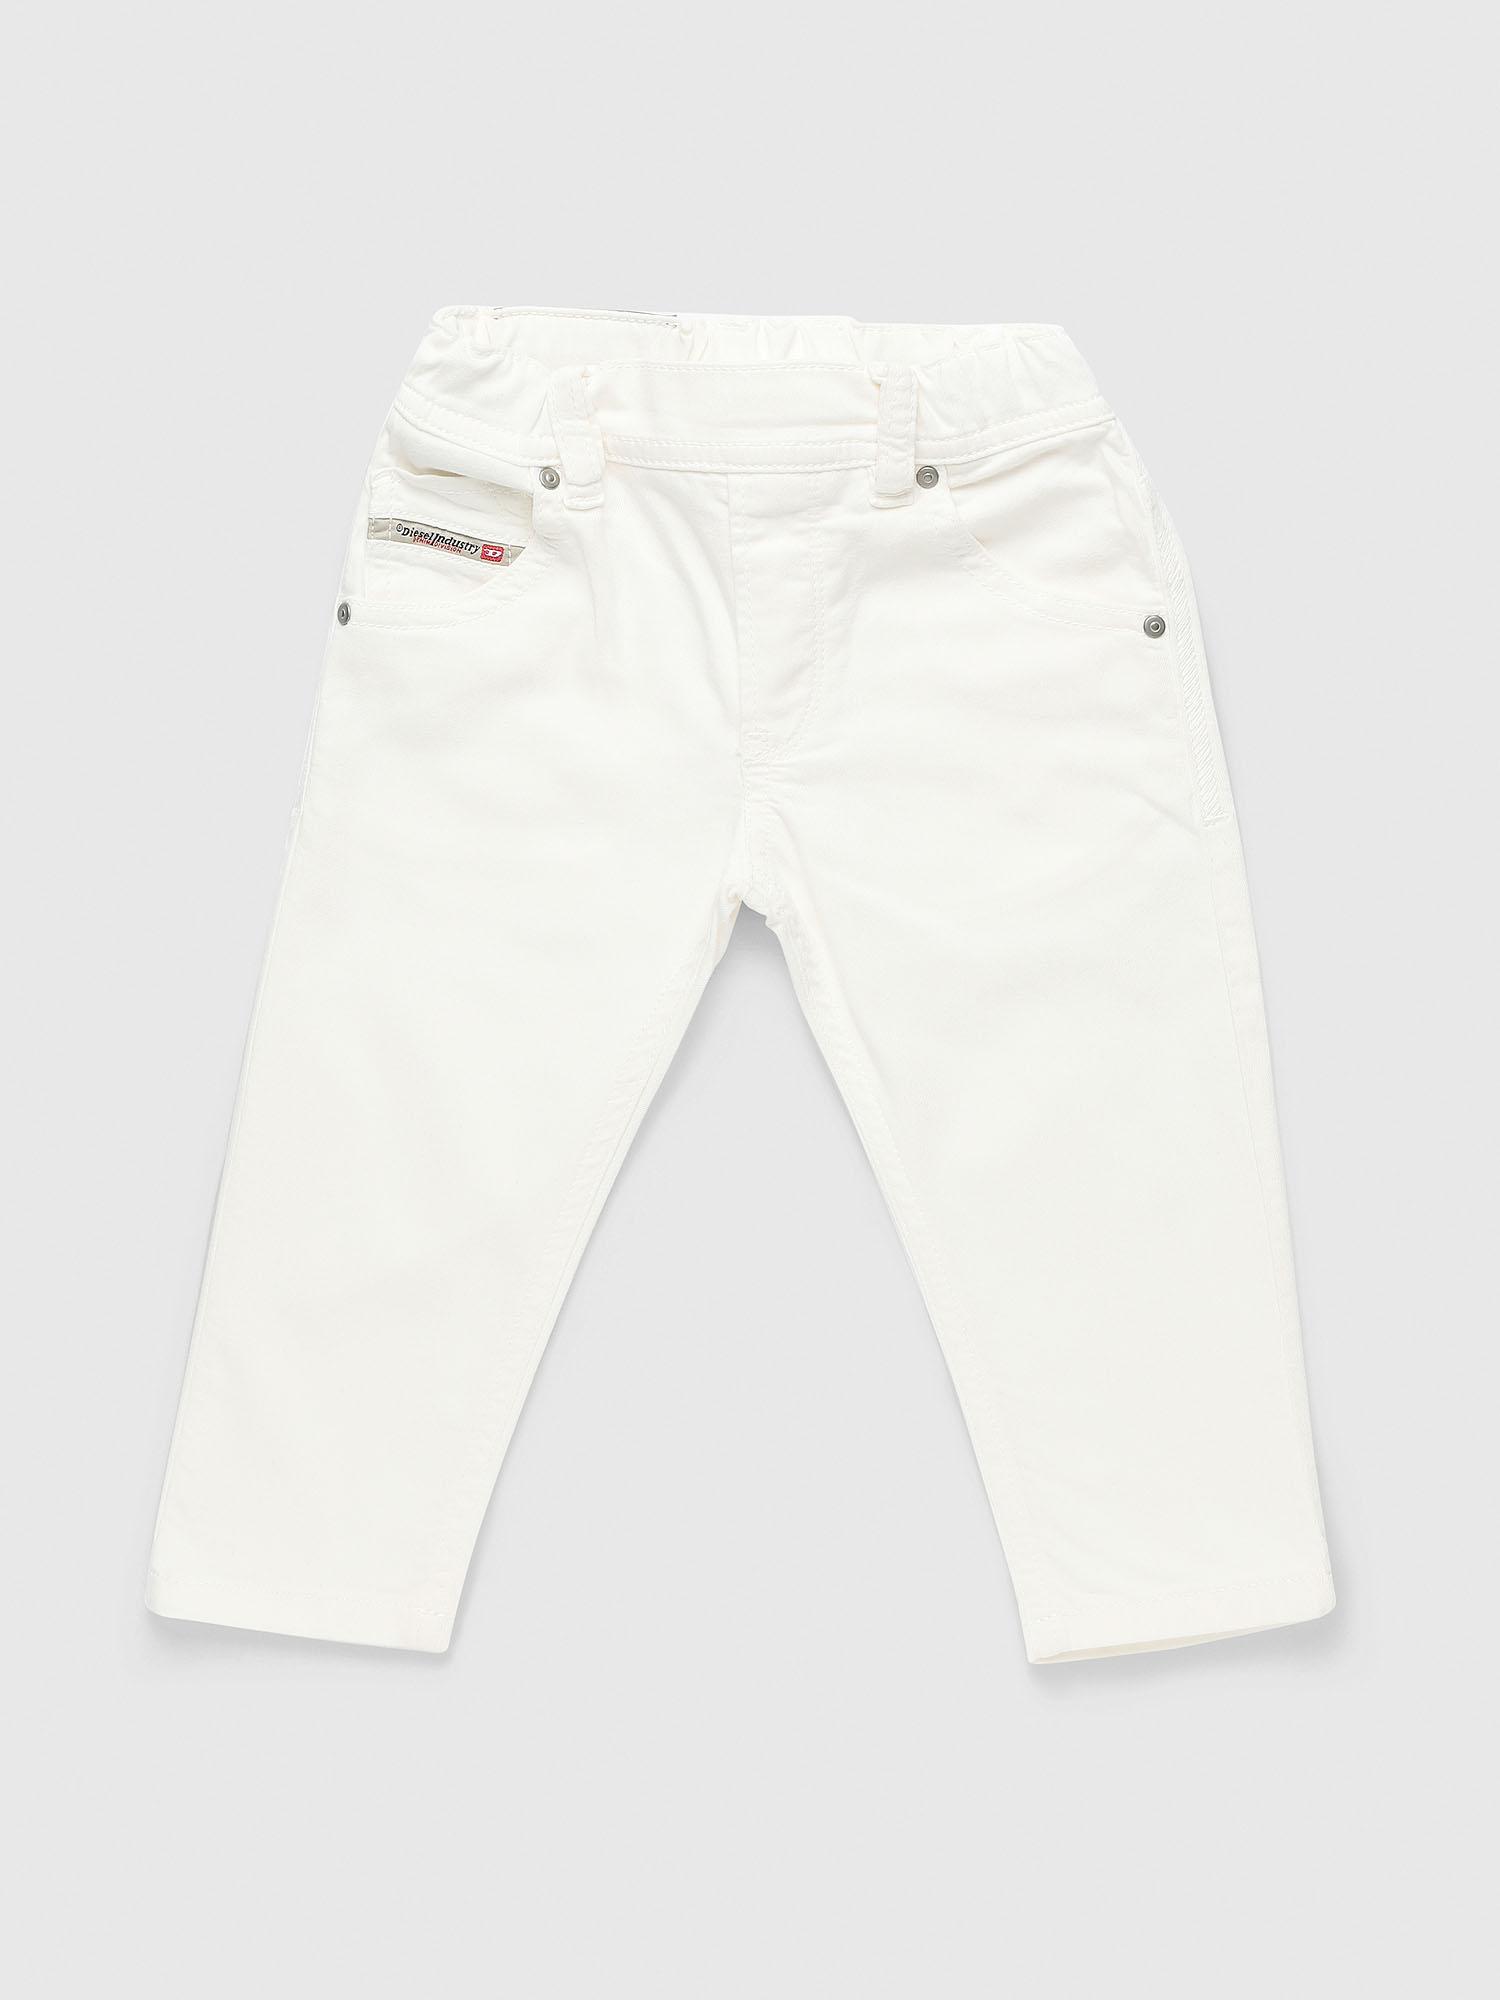 Diesel Jeans KXA95 - White - 9M